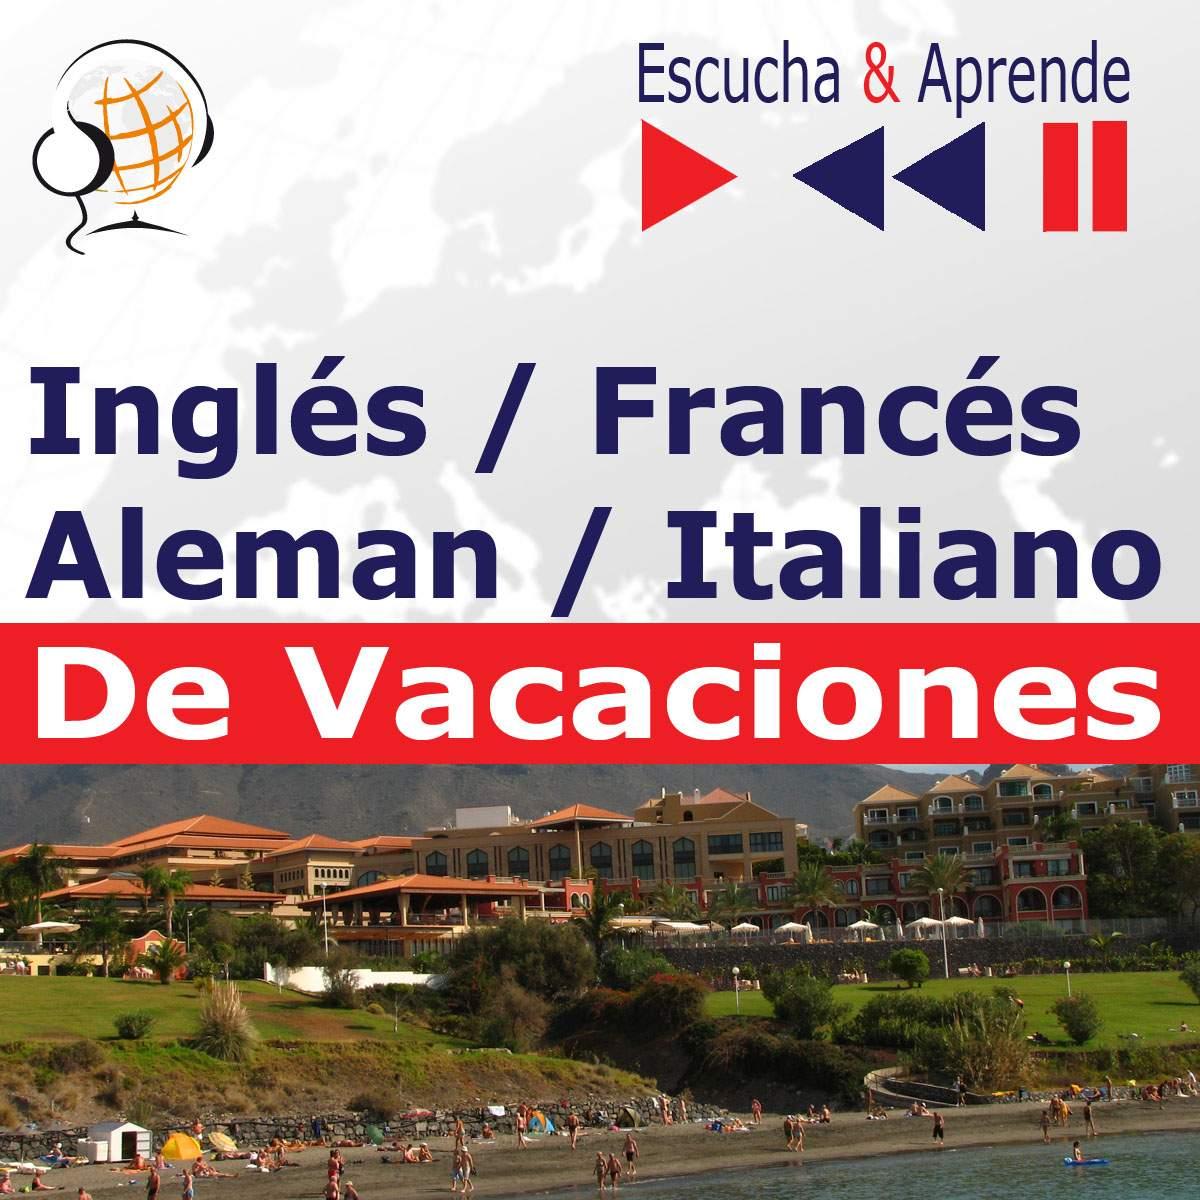 Inglés / Francés / Italiano / Aleman -De Vacaciones. Escucha & Aprende (for Spanish speakers) - Audiobook (Książka audio MP3) do pobrania w całości w archiwum ZIP